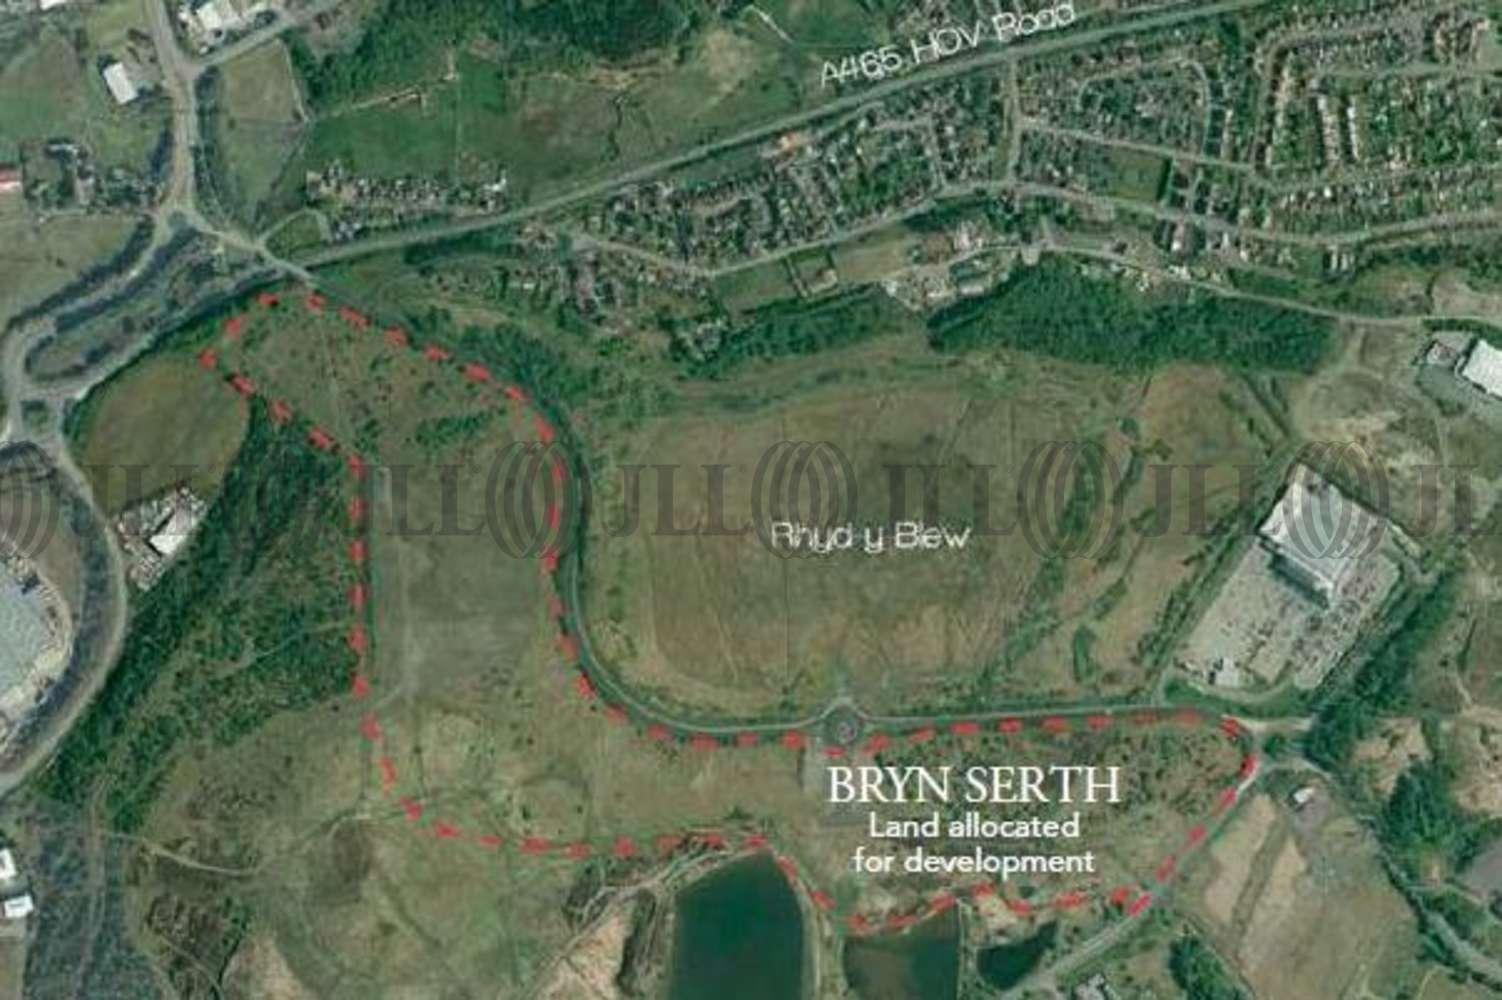 Industrial Ebbw vale, NP23 6PL - Land at Bryn Serth - 5650